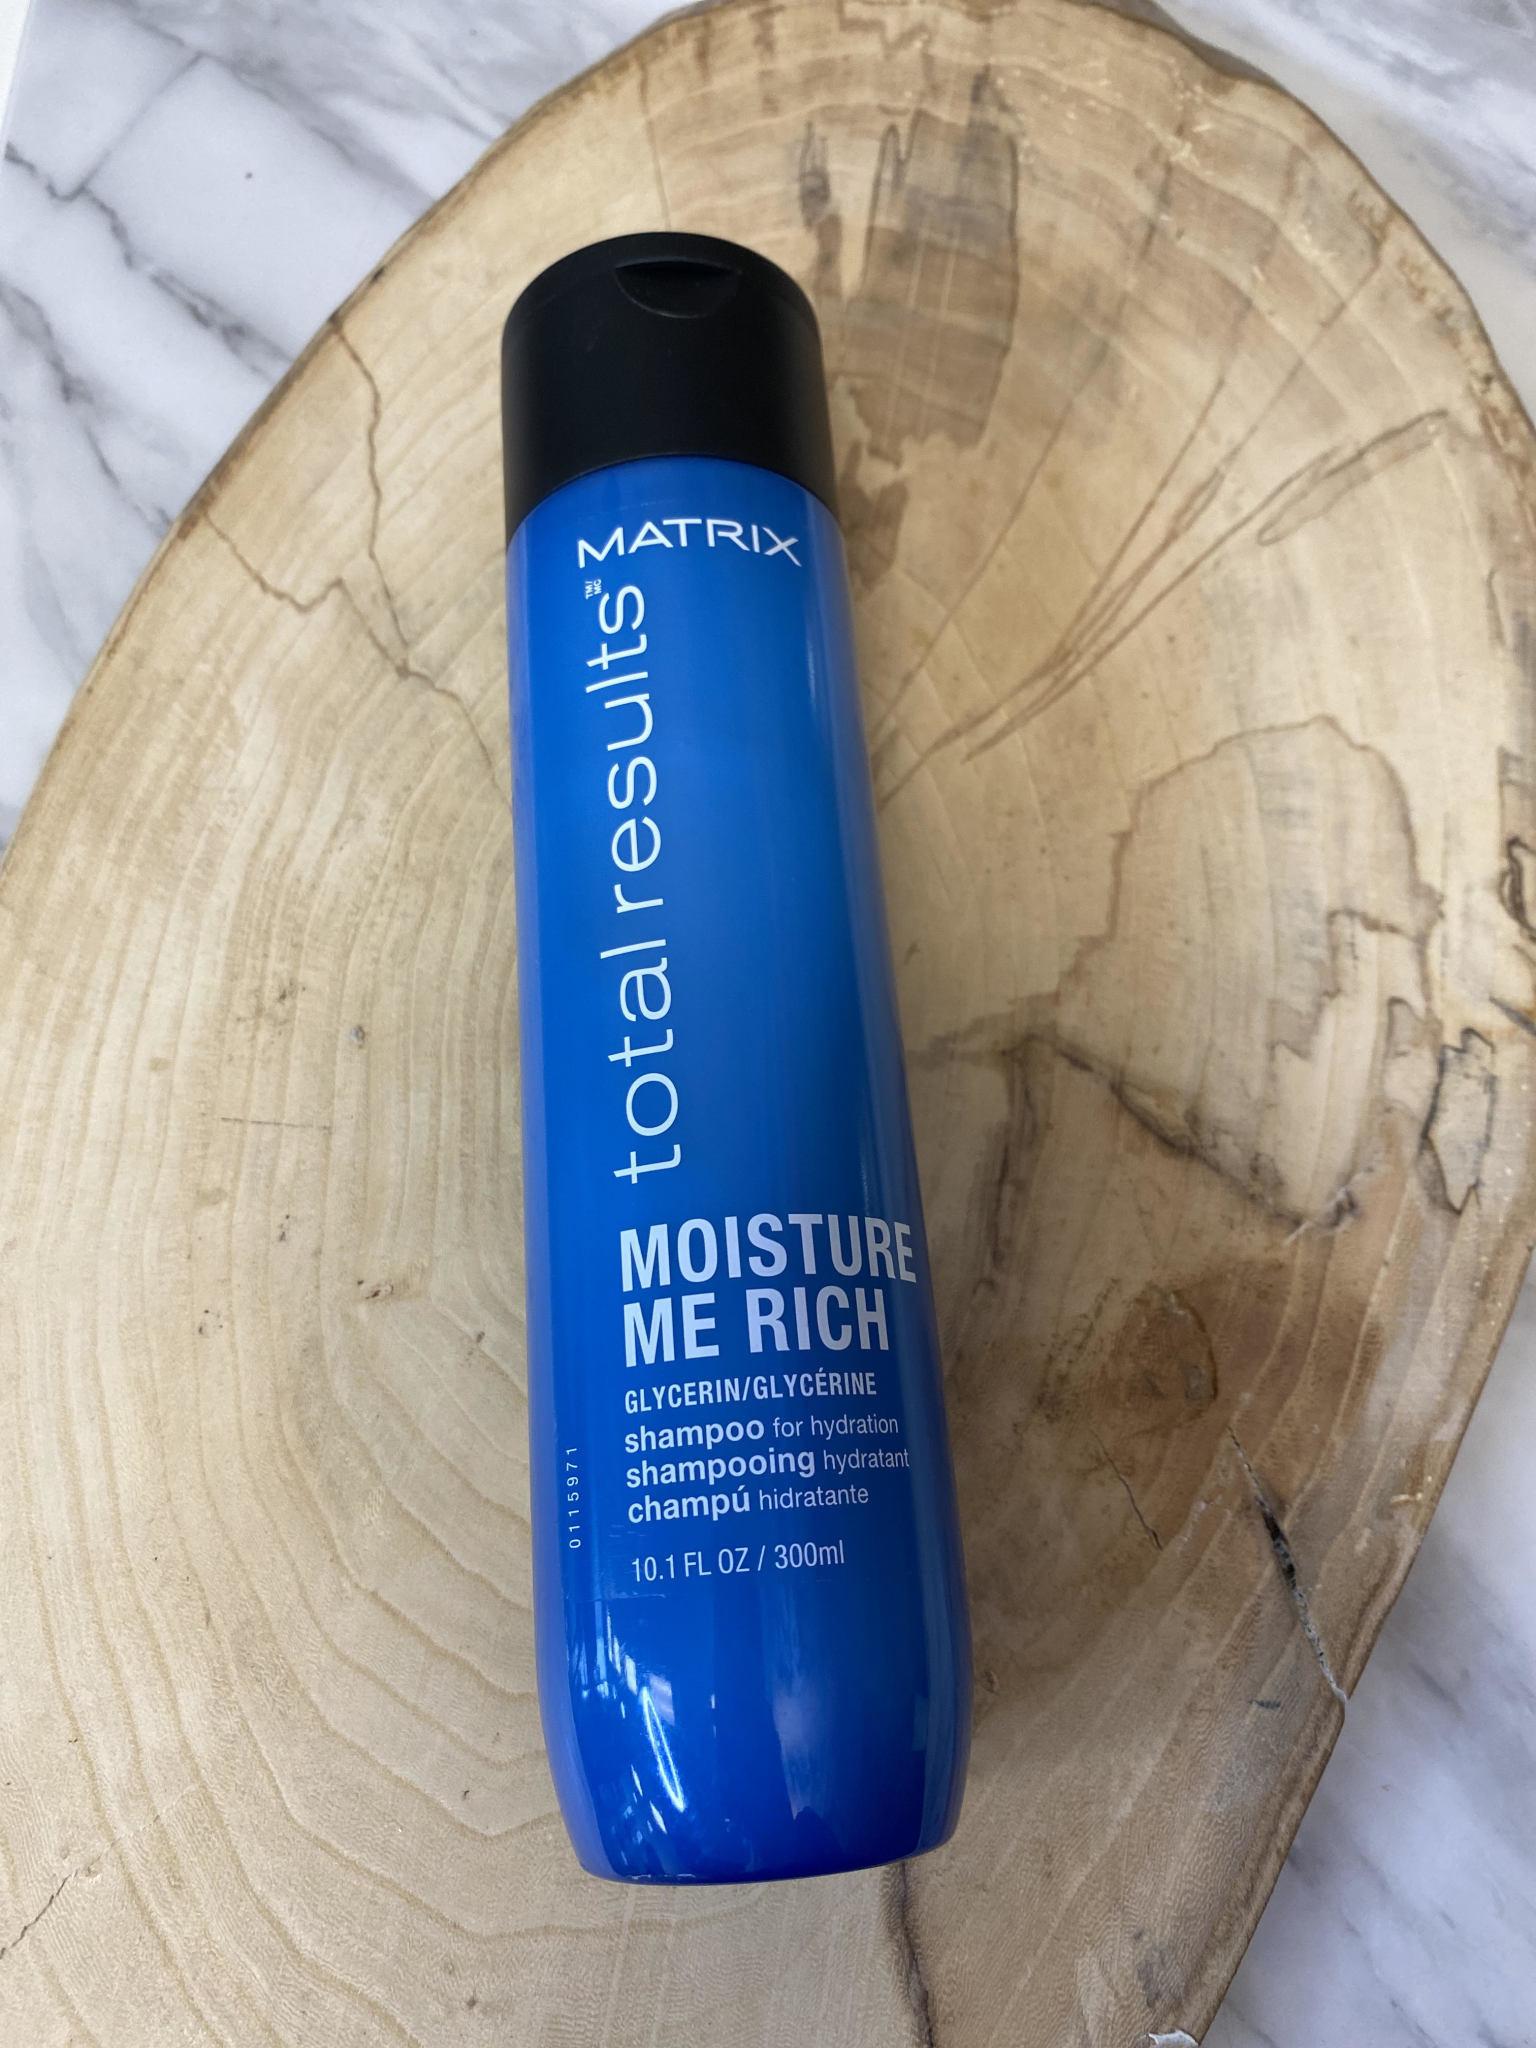 Matrix Moisture me rich shampooing 300ml